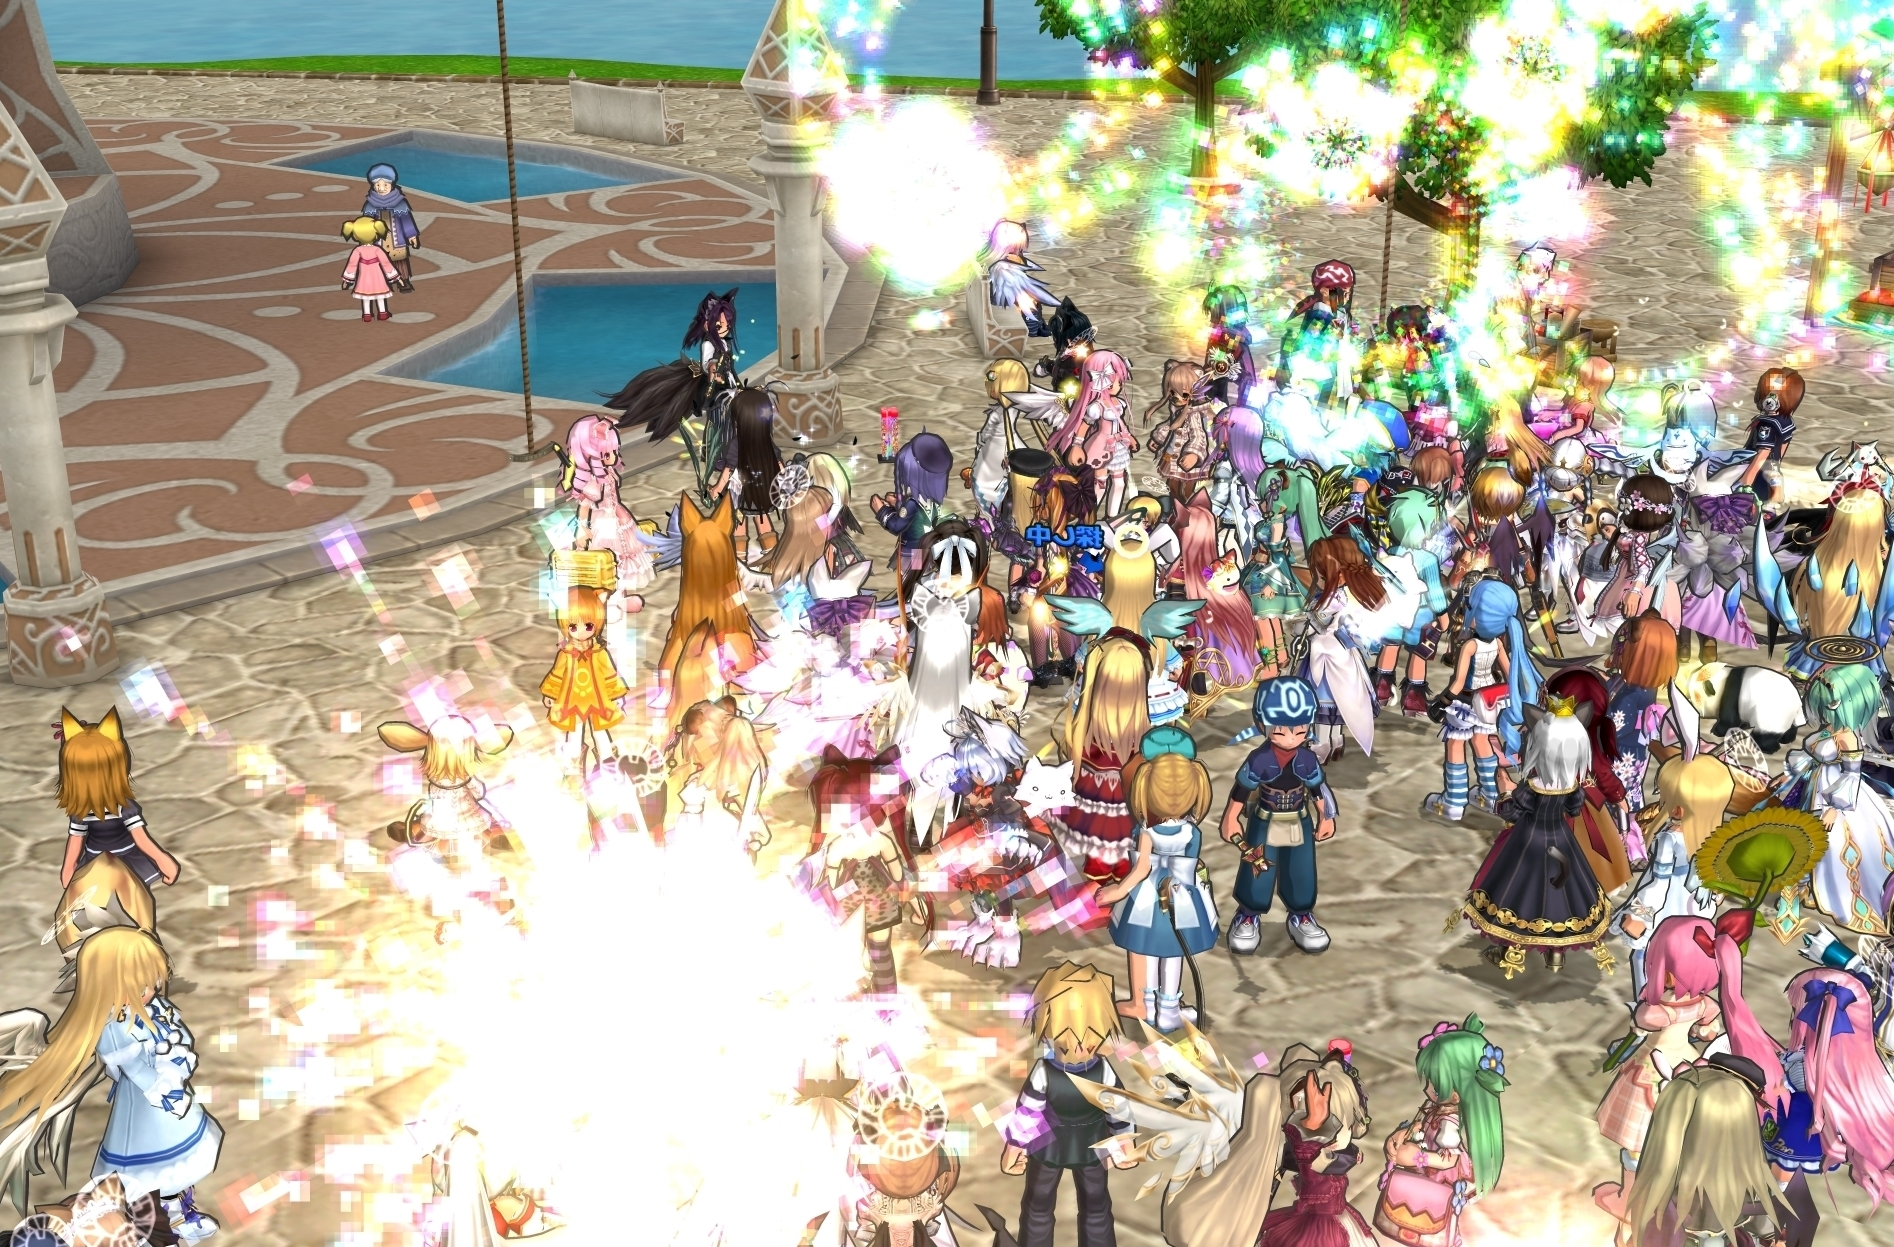 003_5_開会式の花火